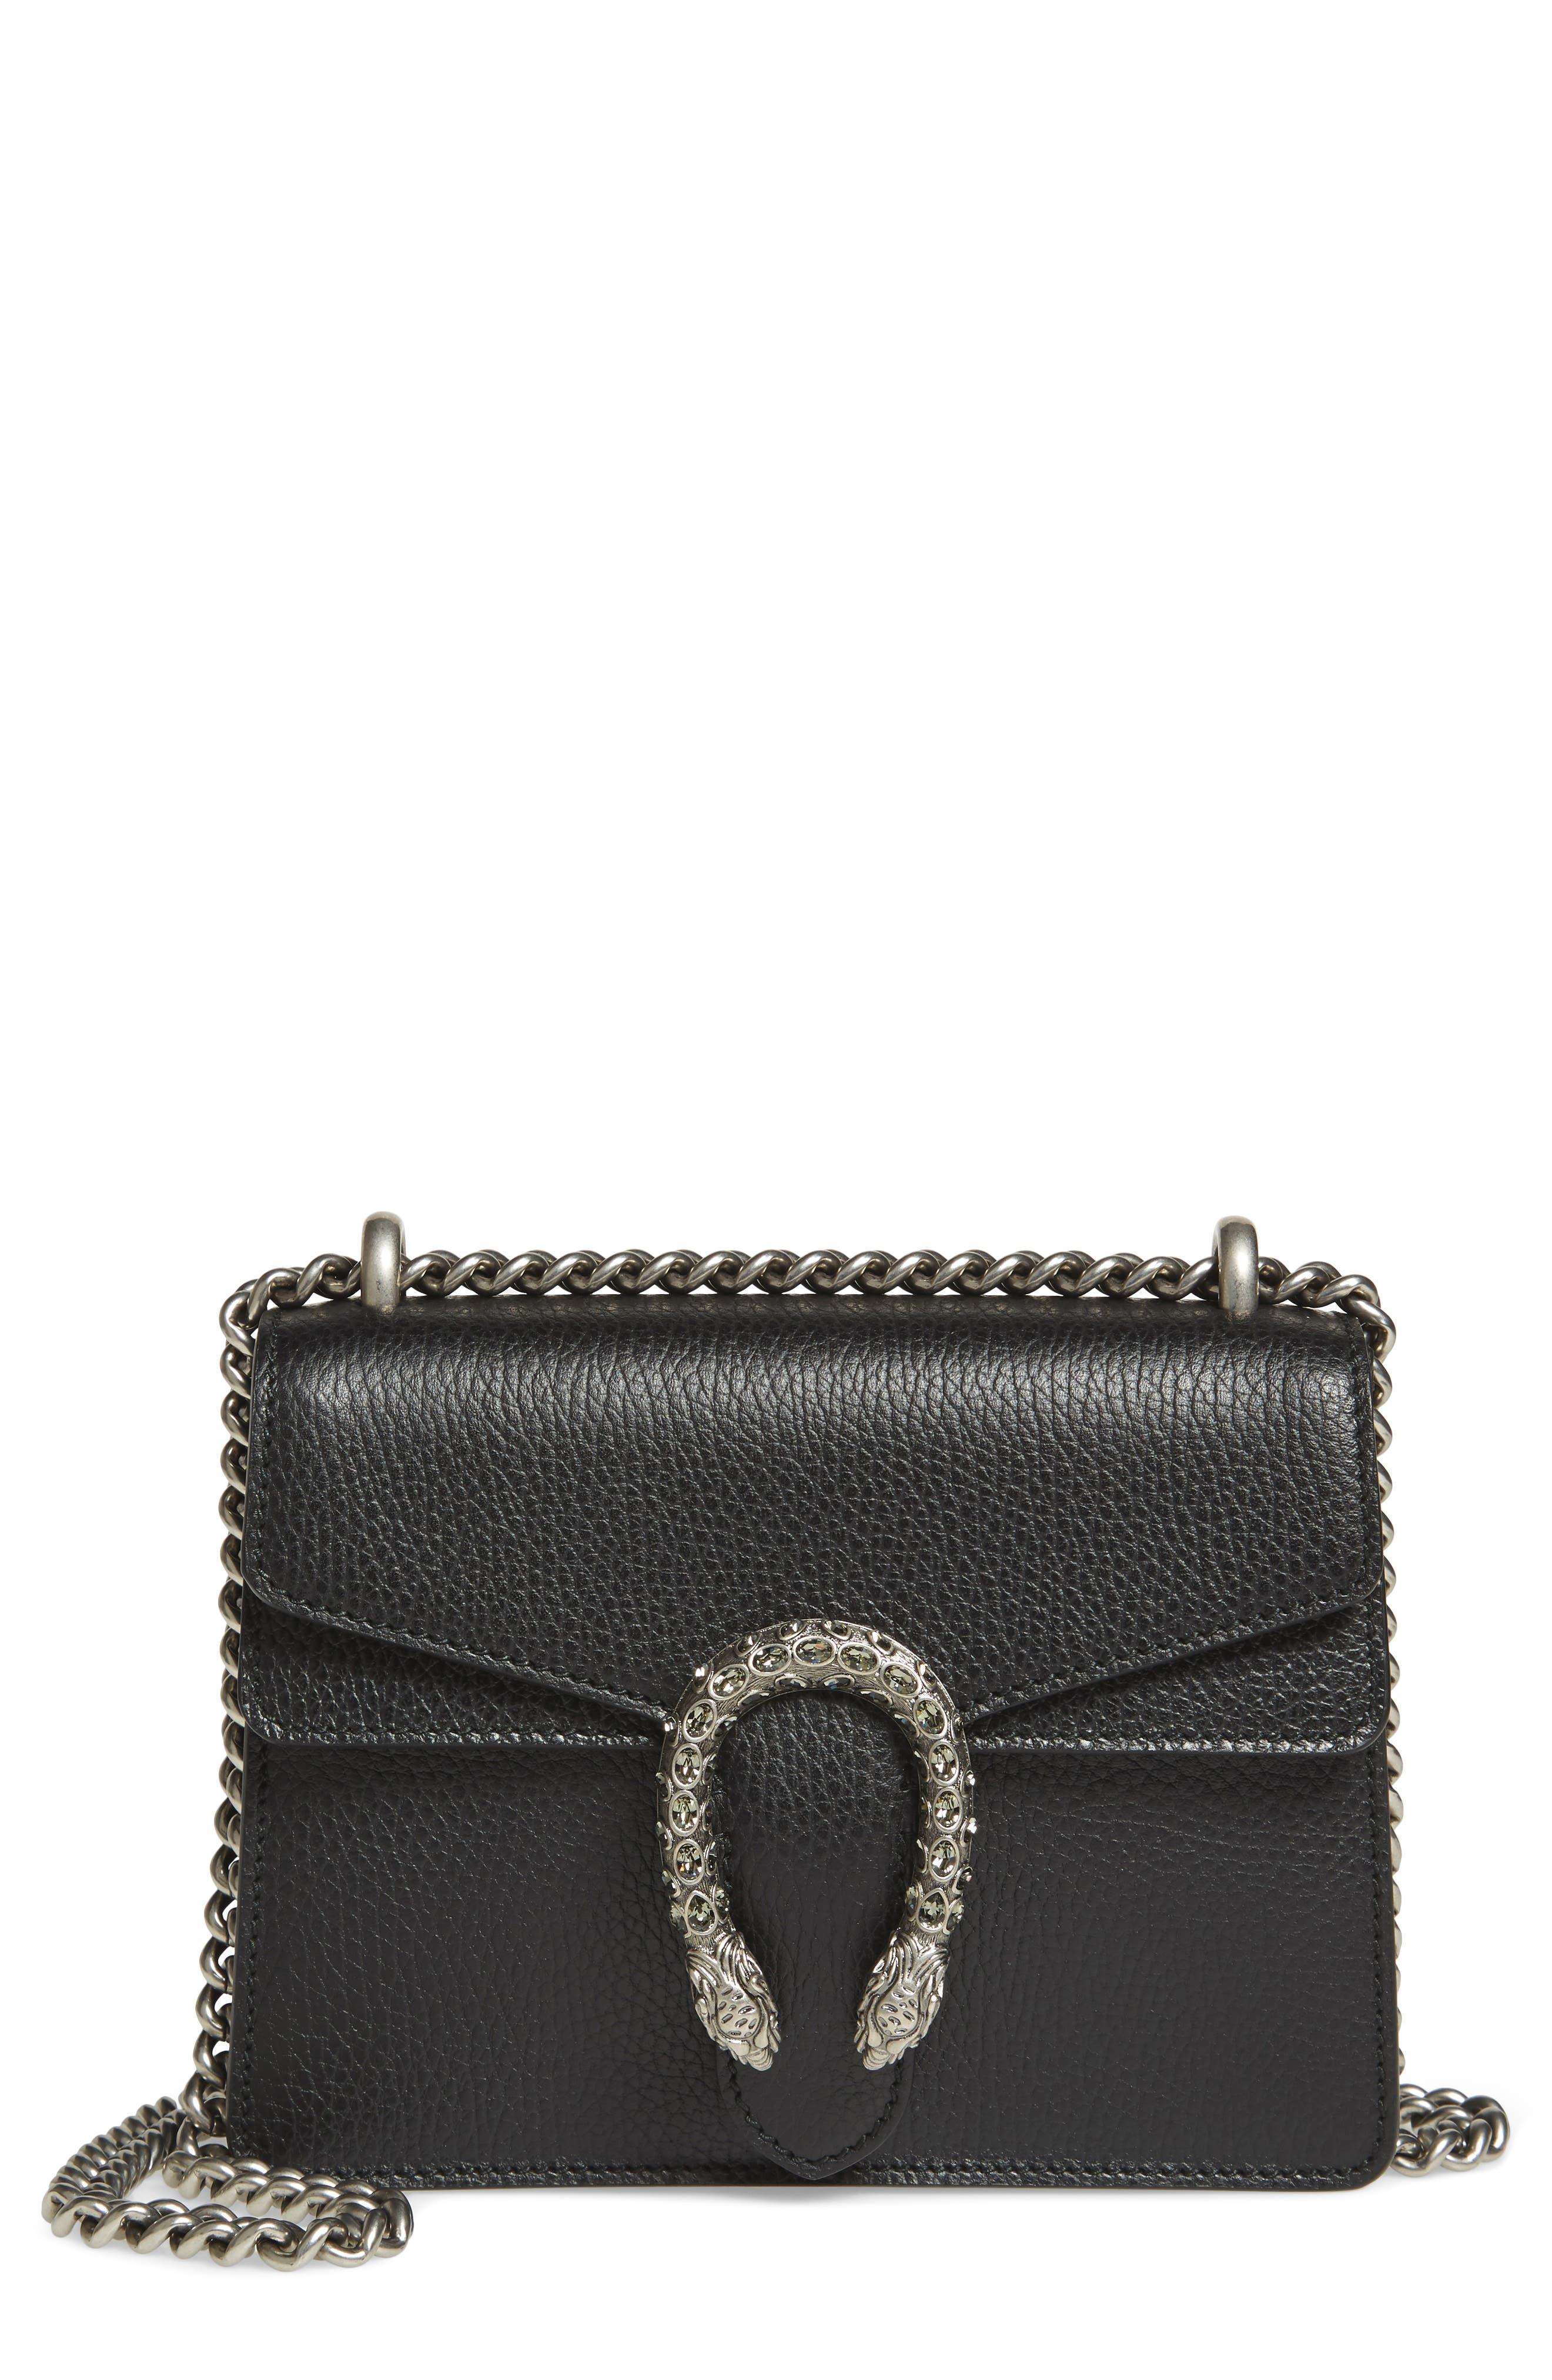 Main Image - Gucci Mini Dionysus Leather Shoulder Bag